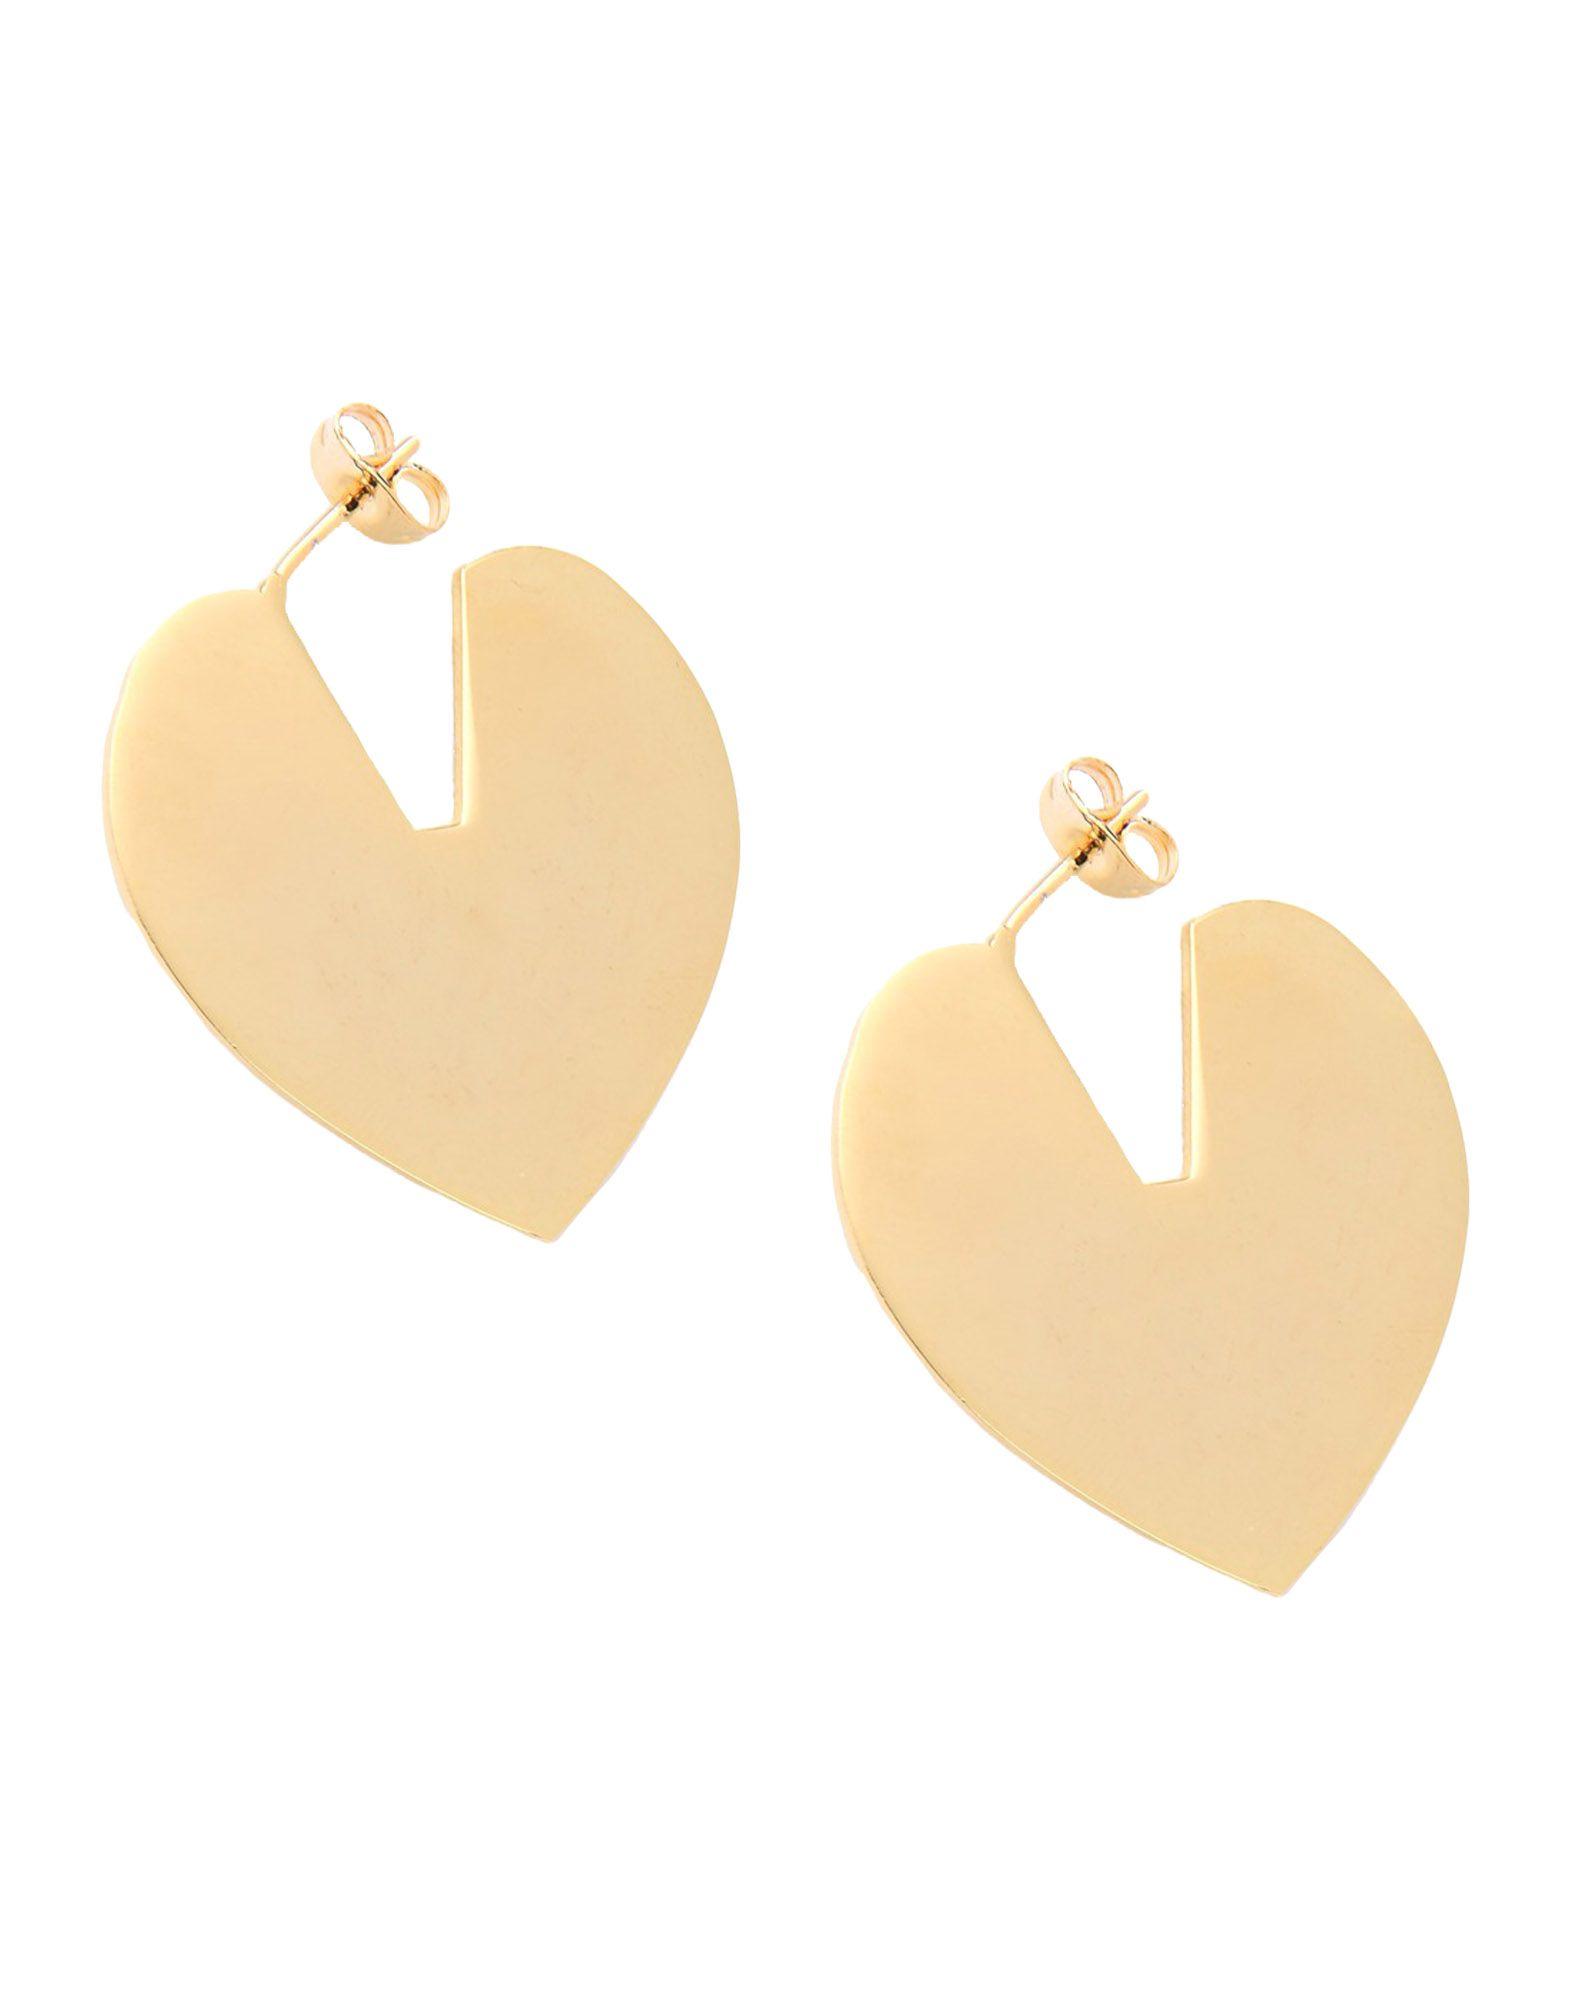 VANINA Earrings in Gold